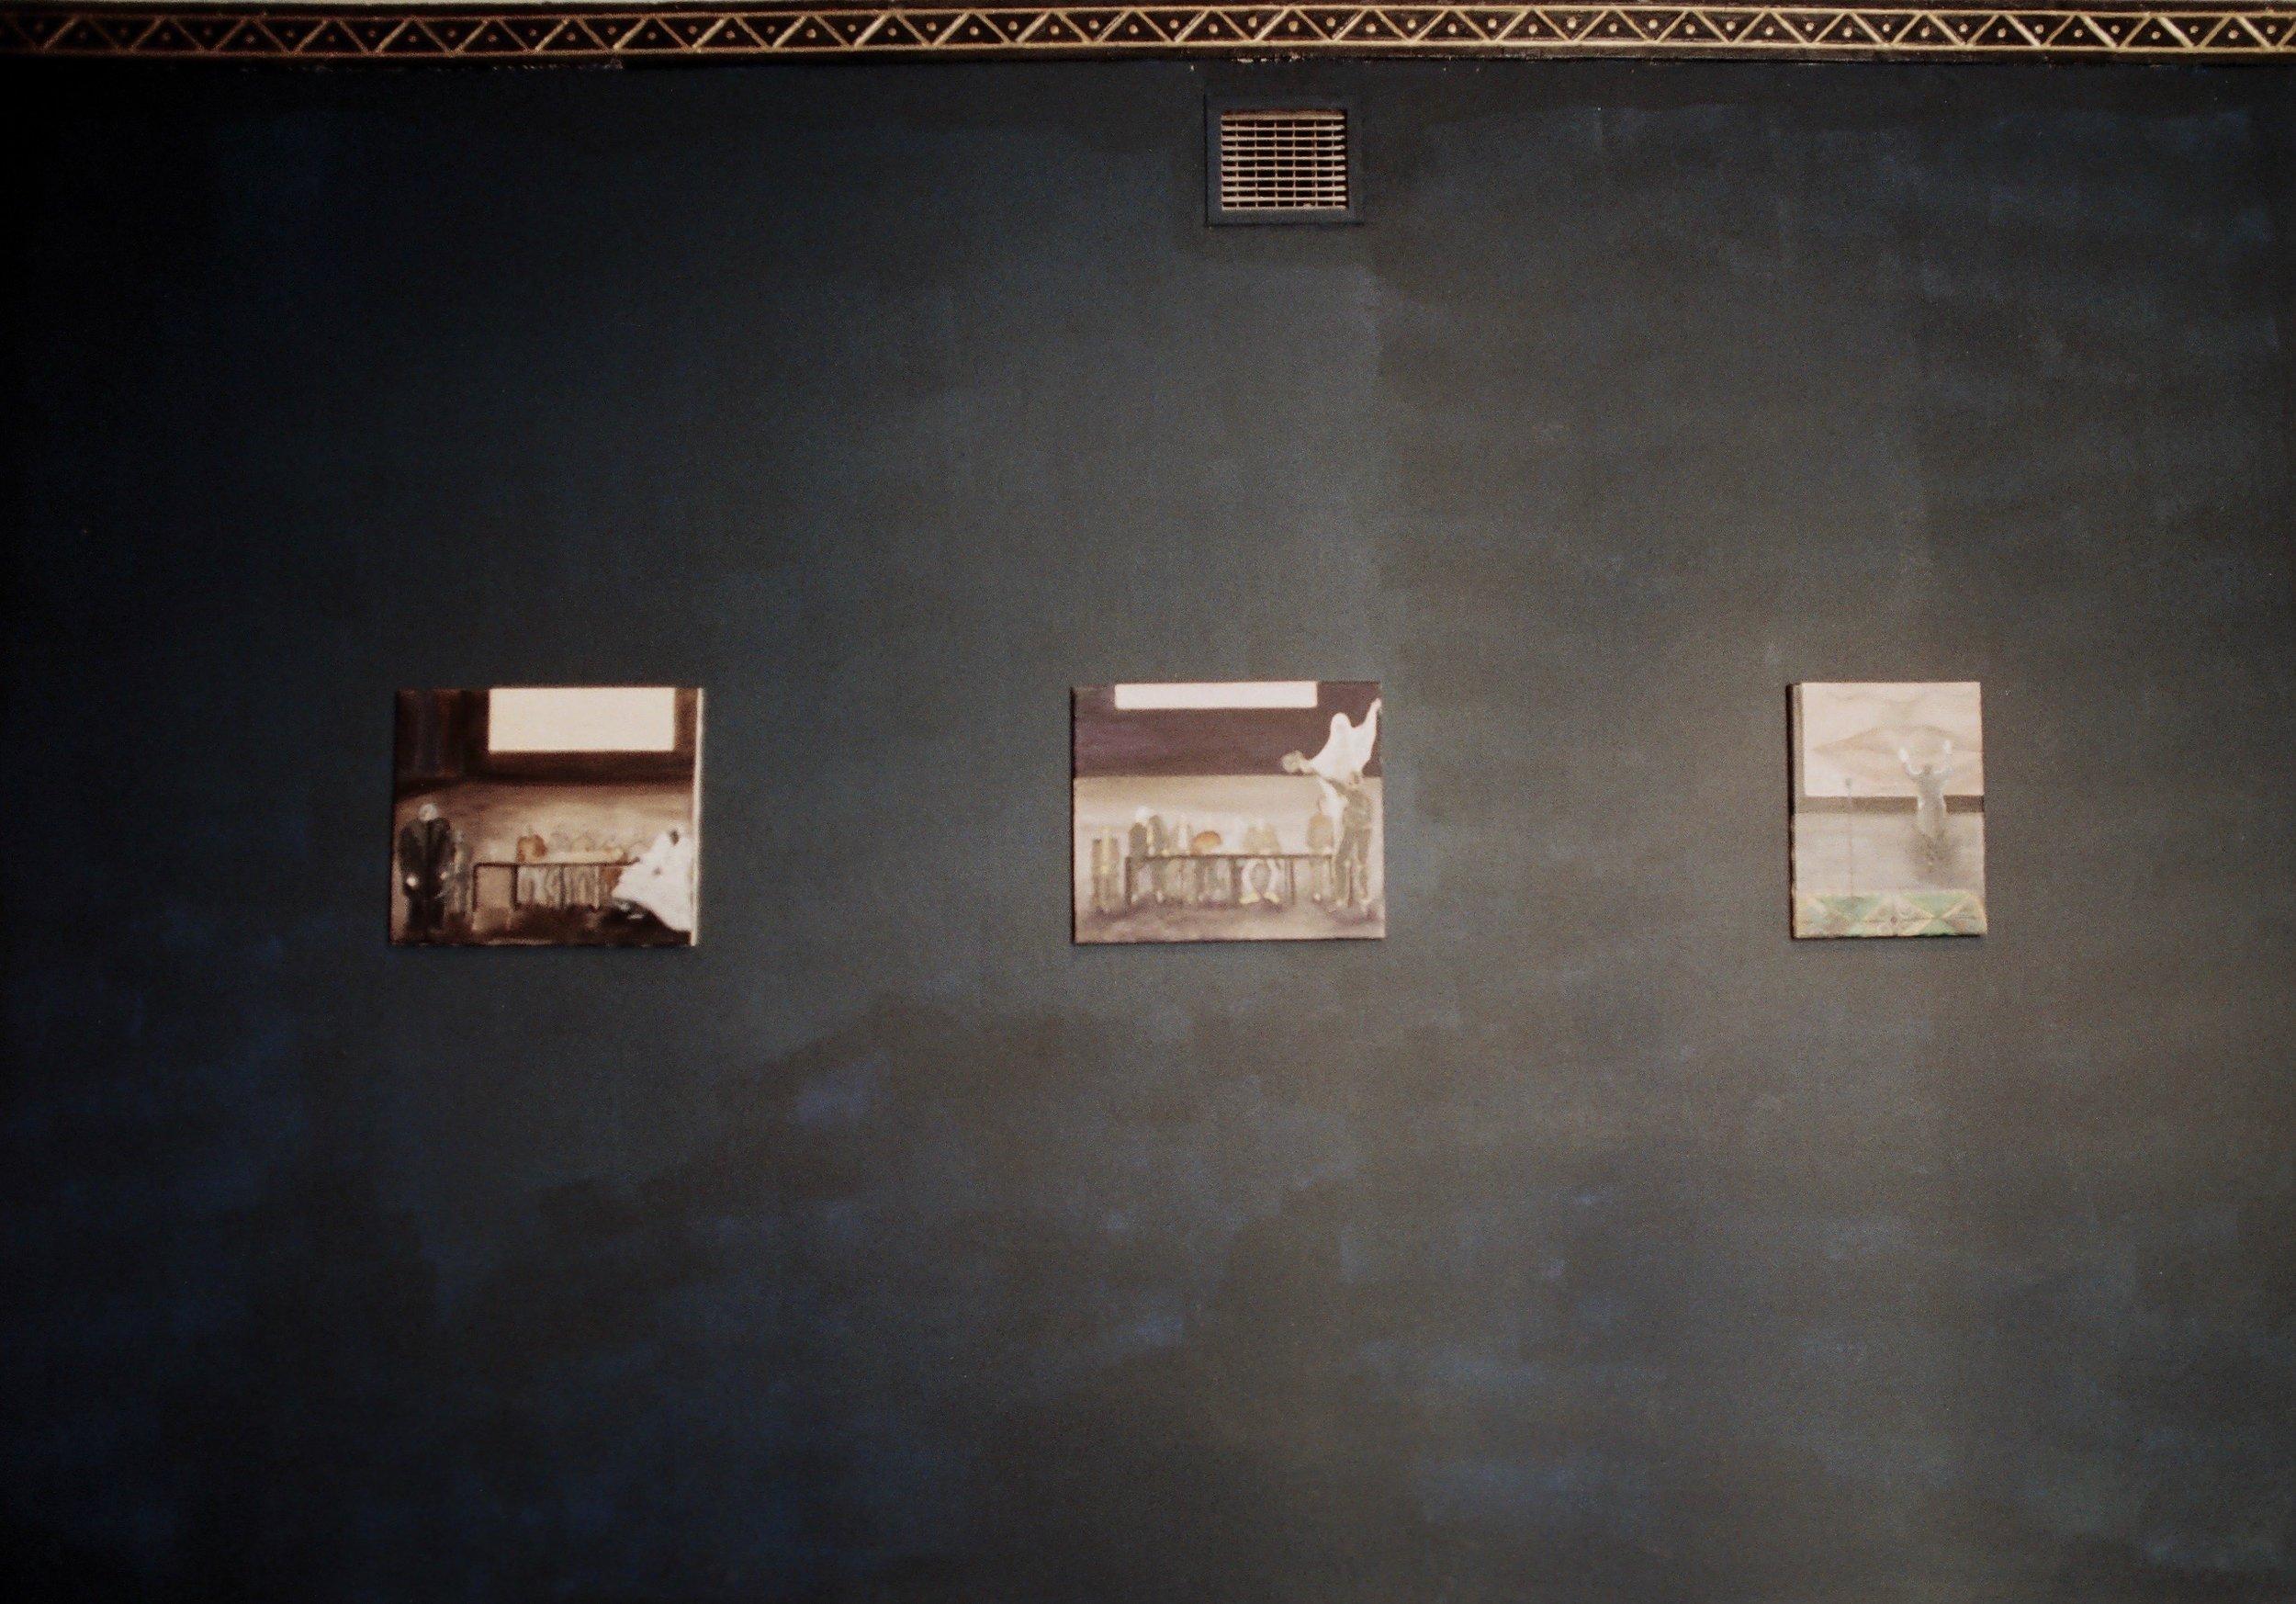 Photos on Film by Thomas Kunstler